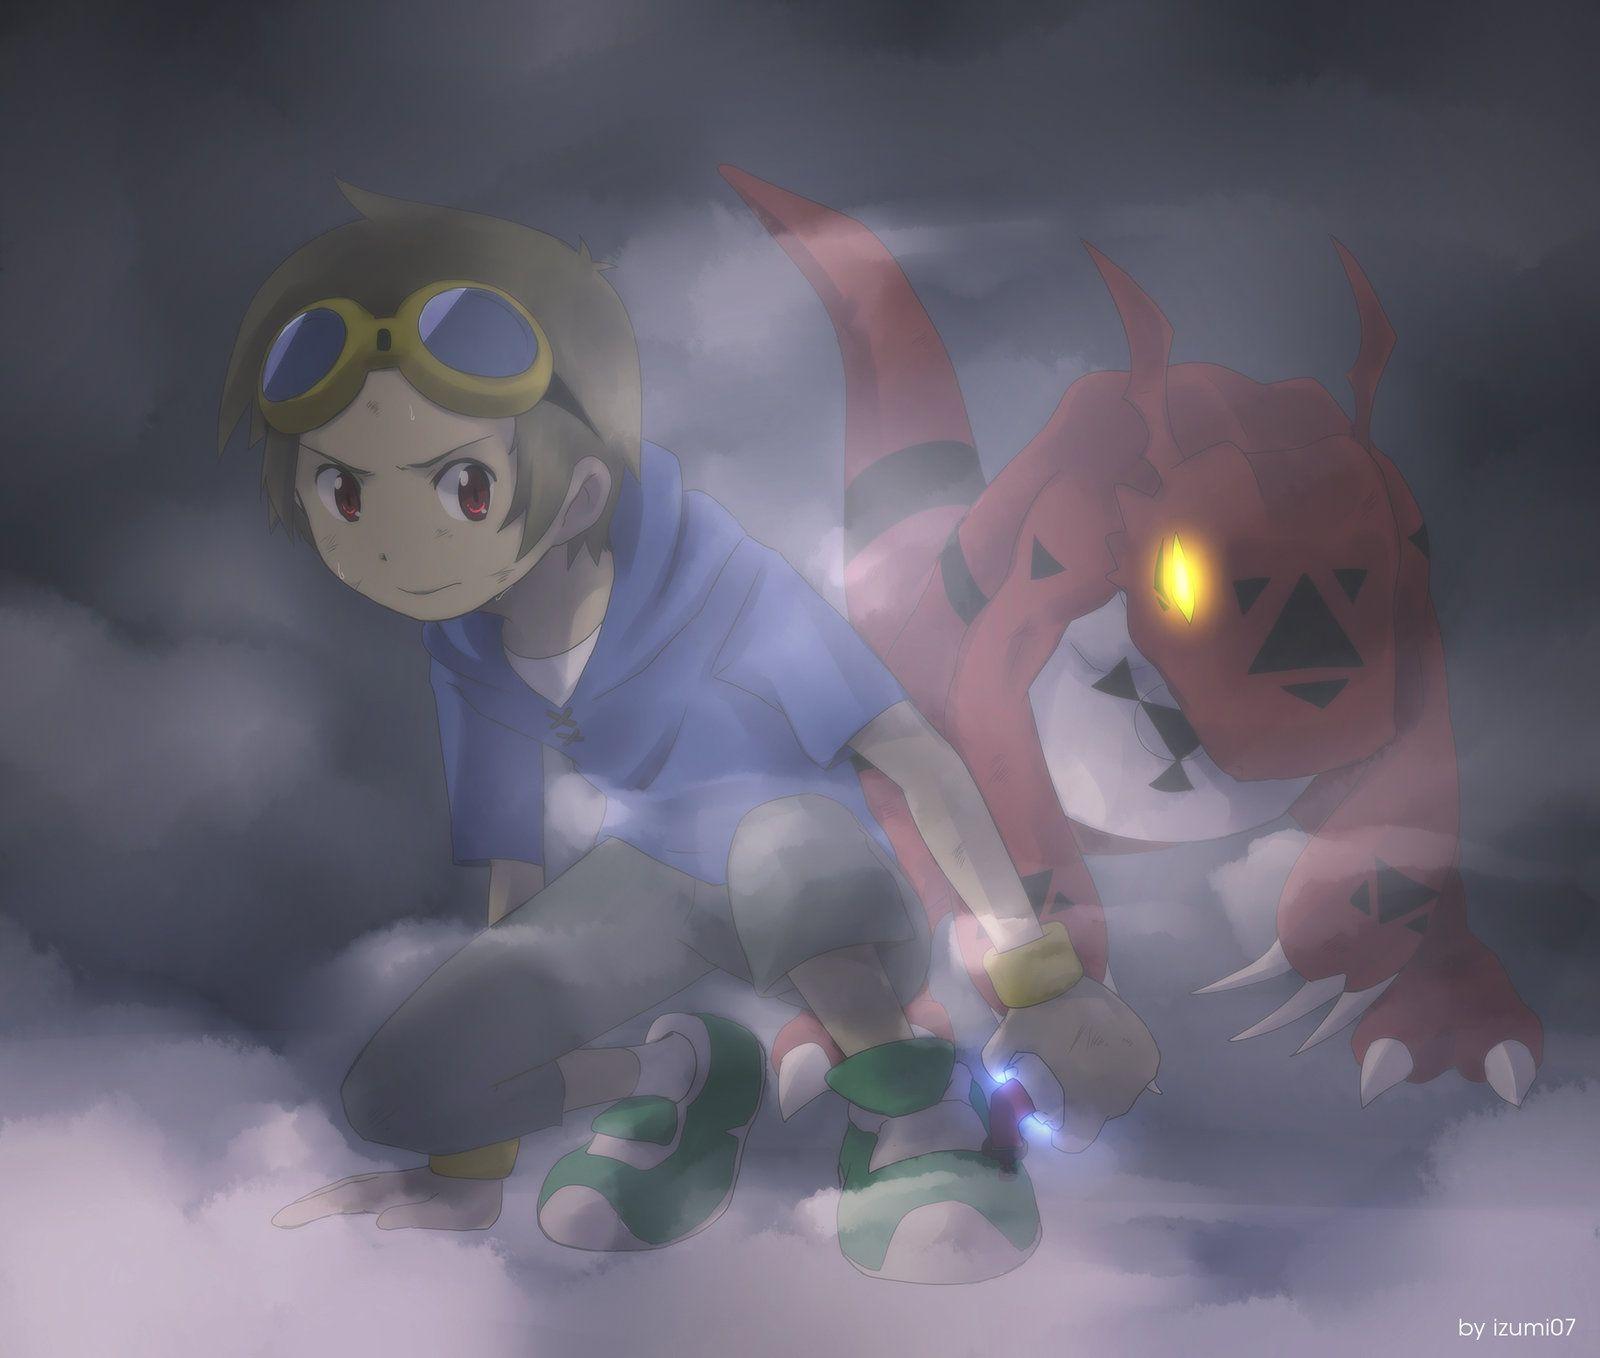 won't be defeated by izumi07.deviantart.com on @deviantART (Takato & Guilmon)